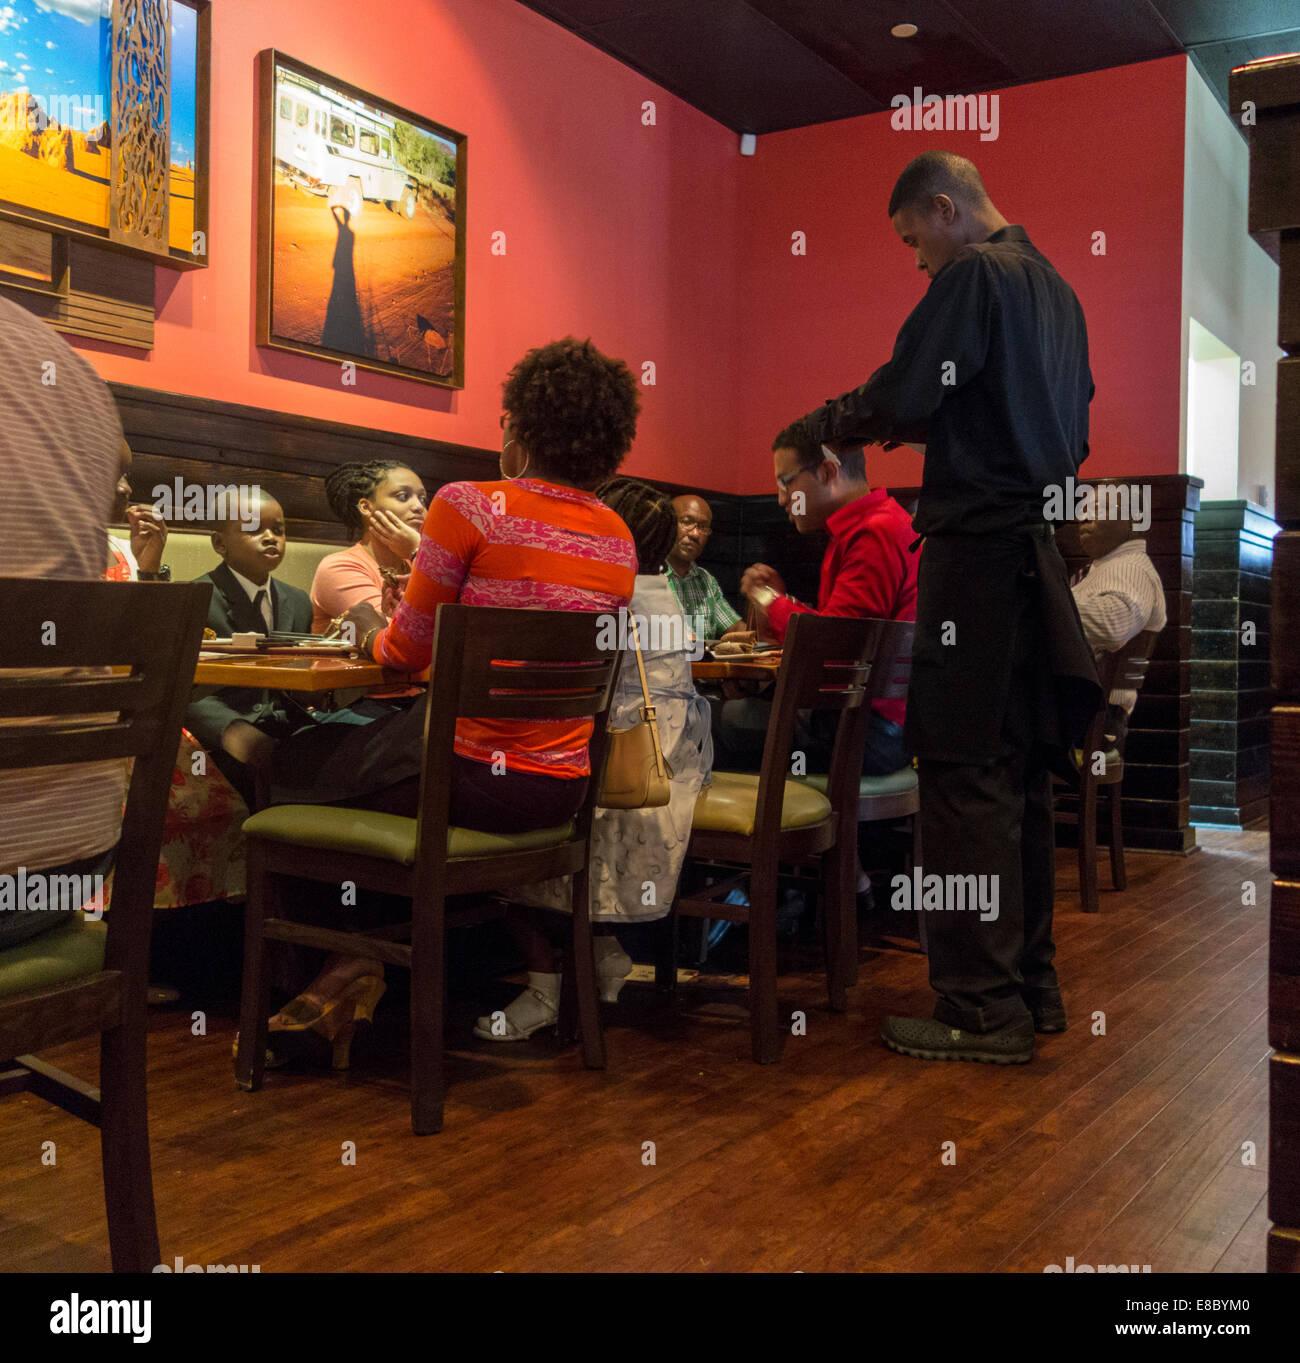 family dining, Outback Steakhouse restaurant, Nassau, Bahamas - Stock Image